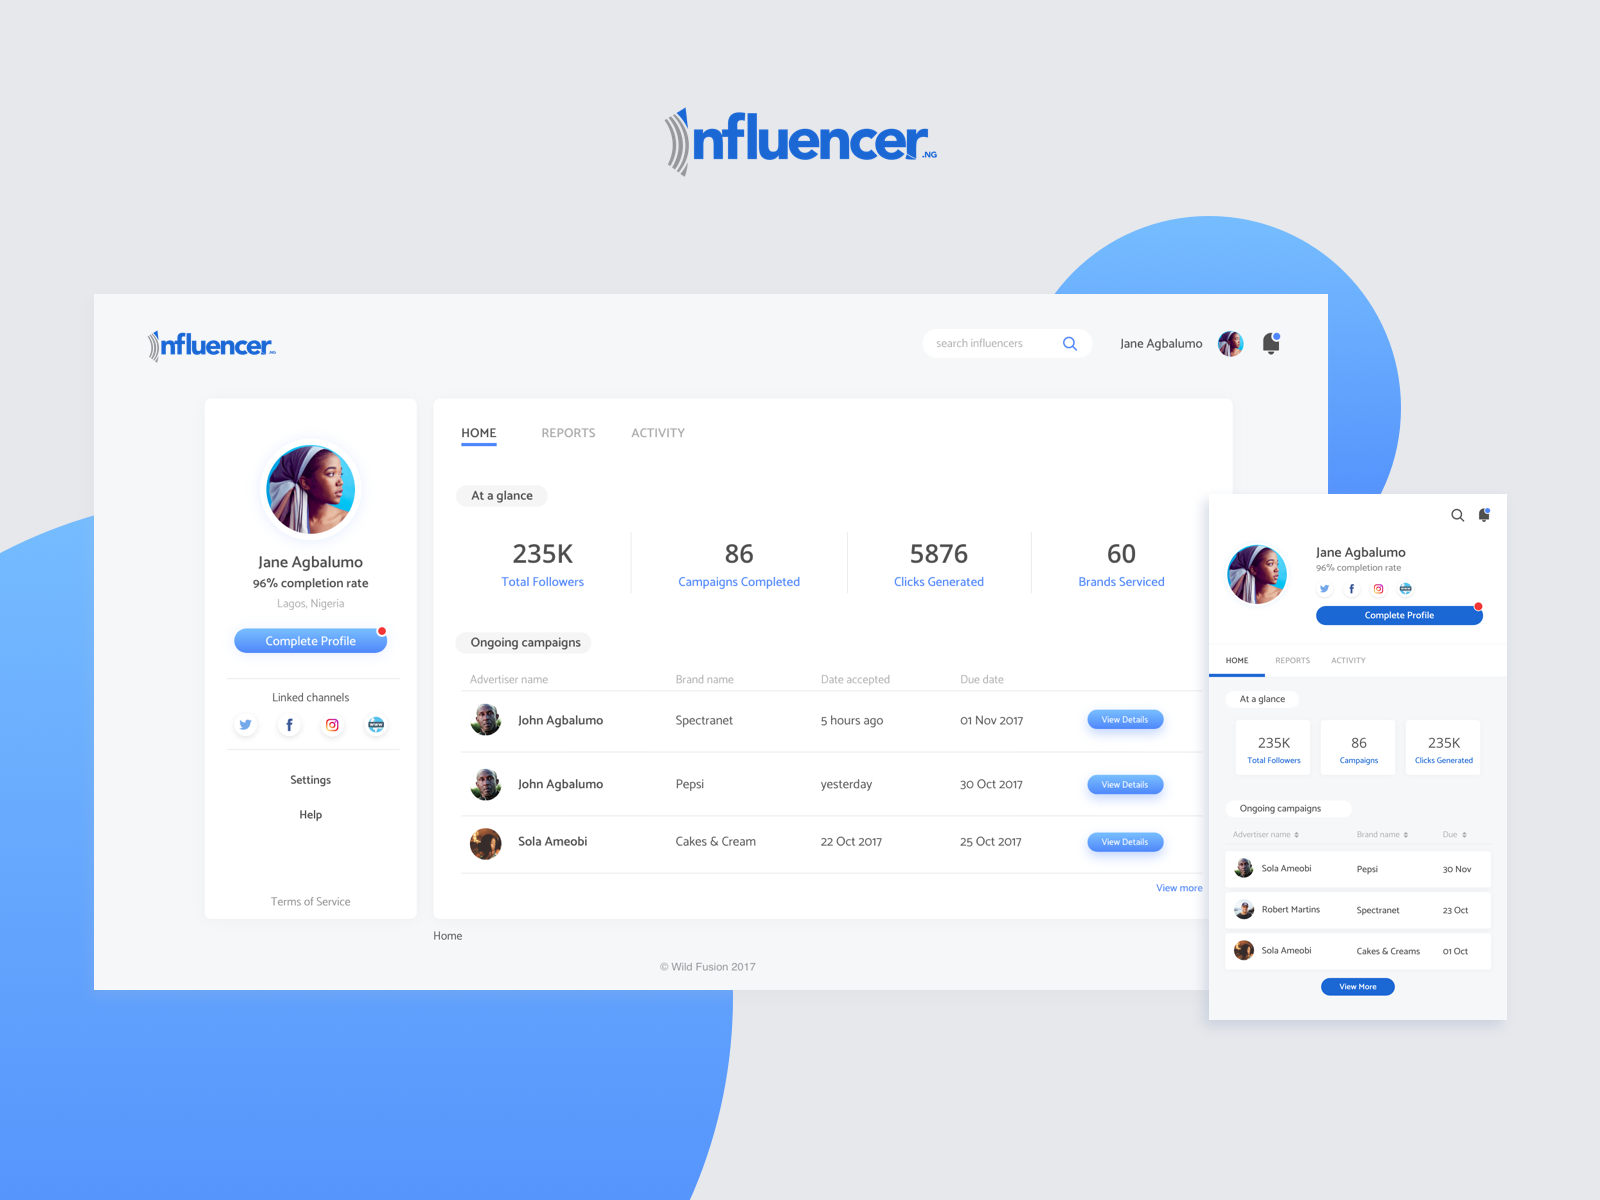 Influencer 1 4x